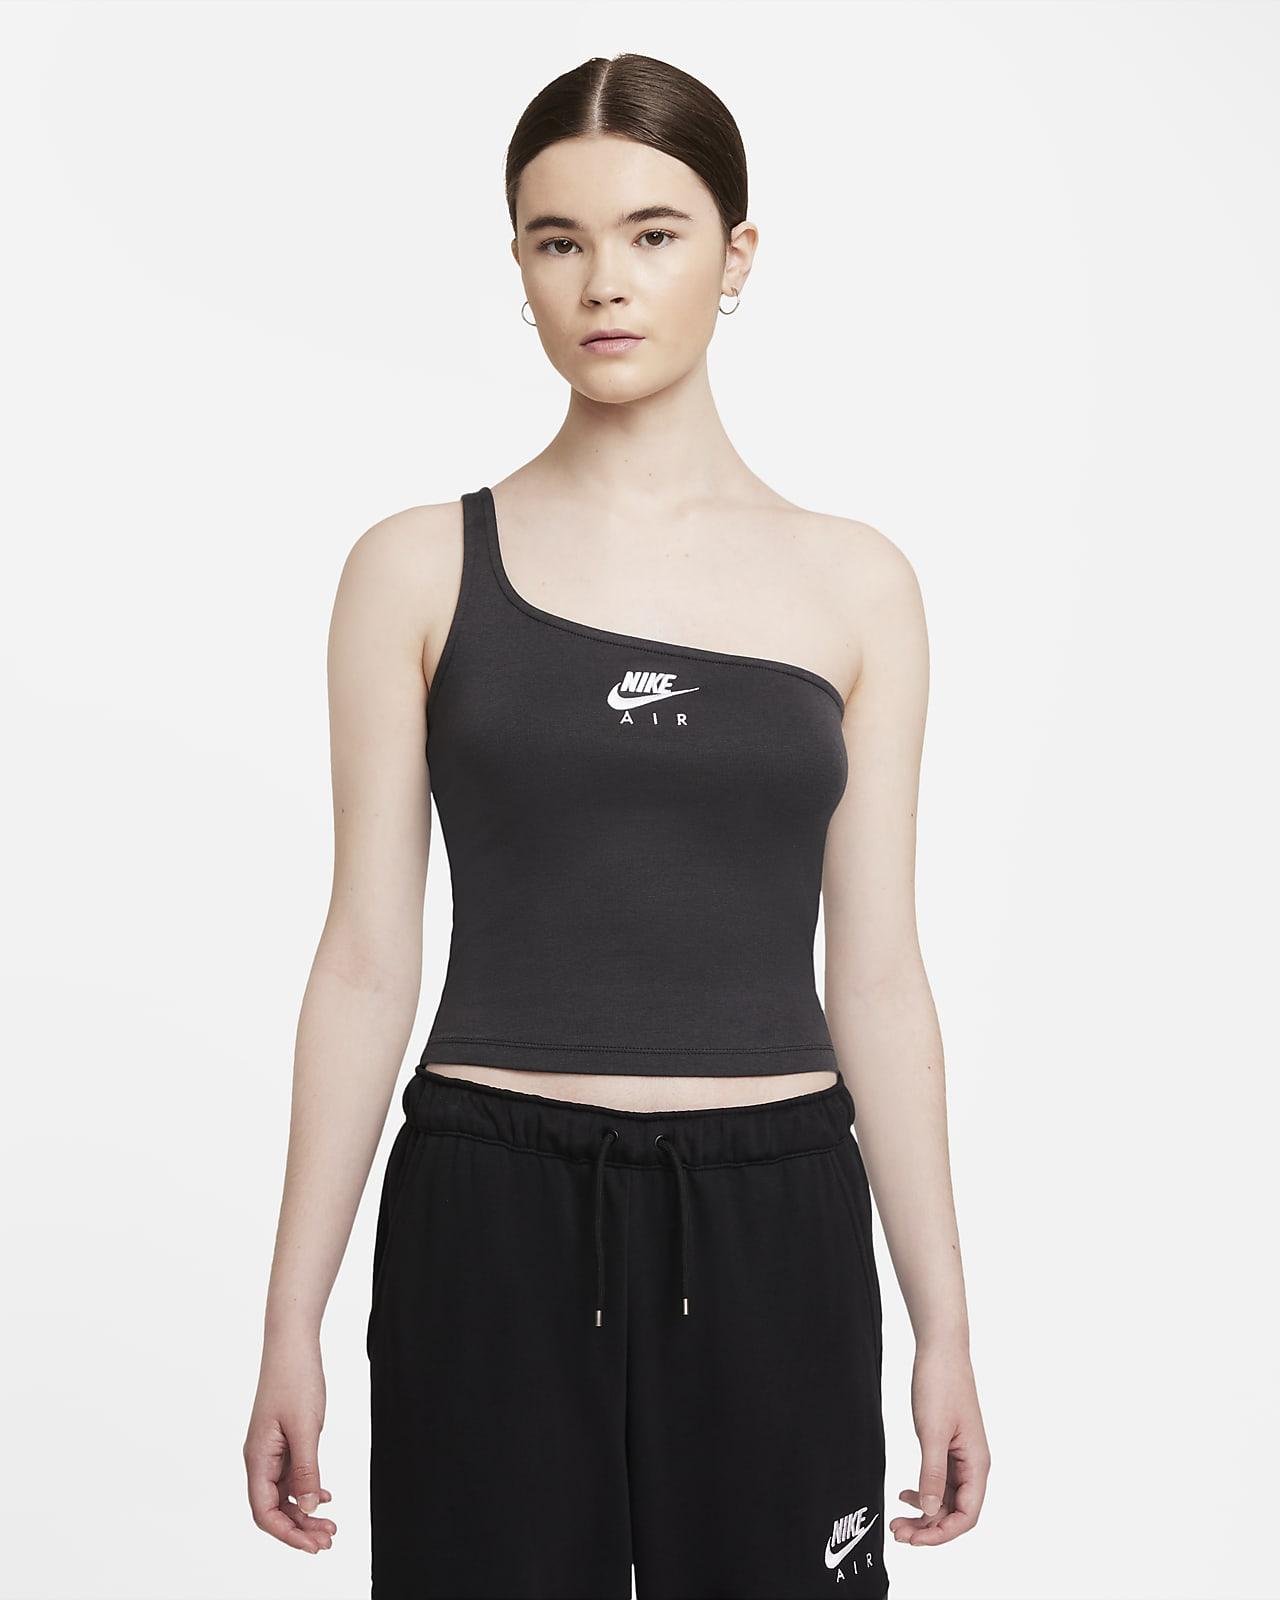 Nike Air Damen-Kurztanktop